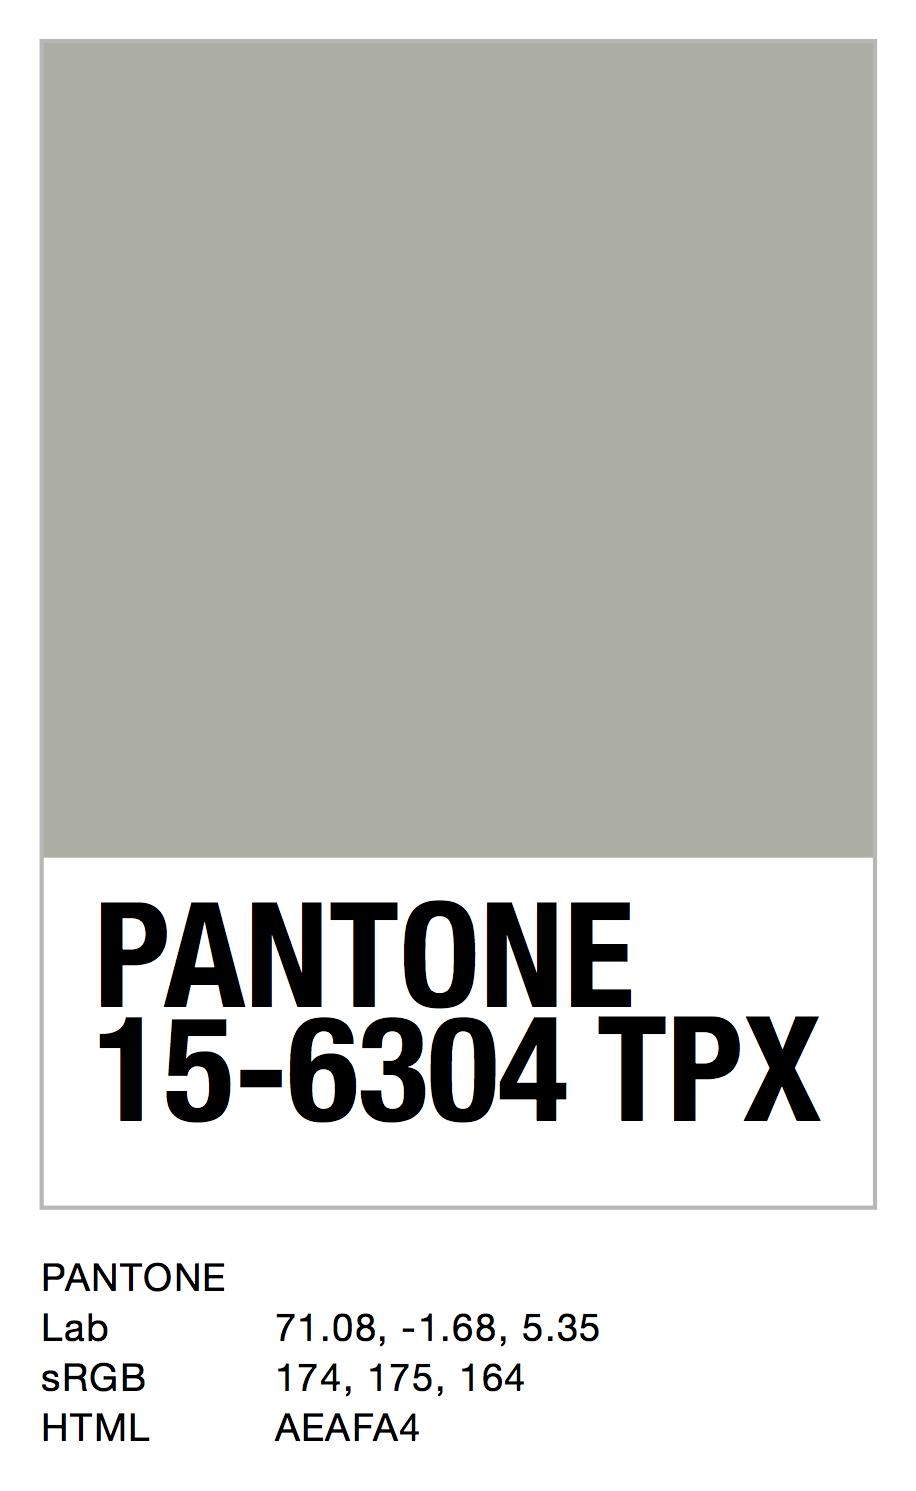 PANTONE 15-6304 TPX.jpg